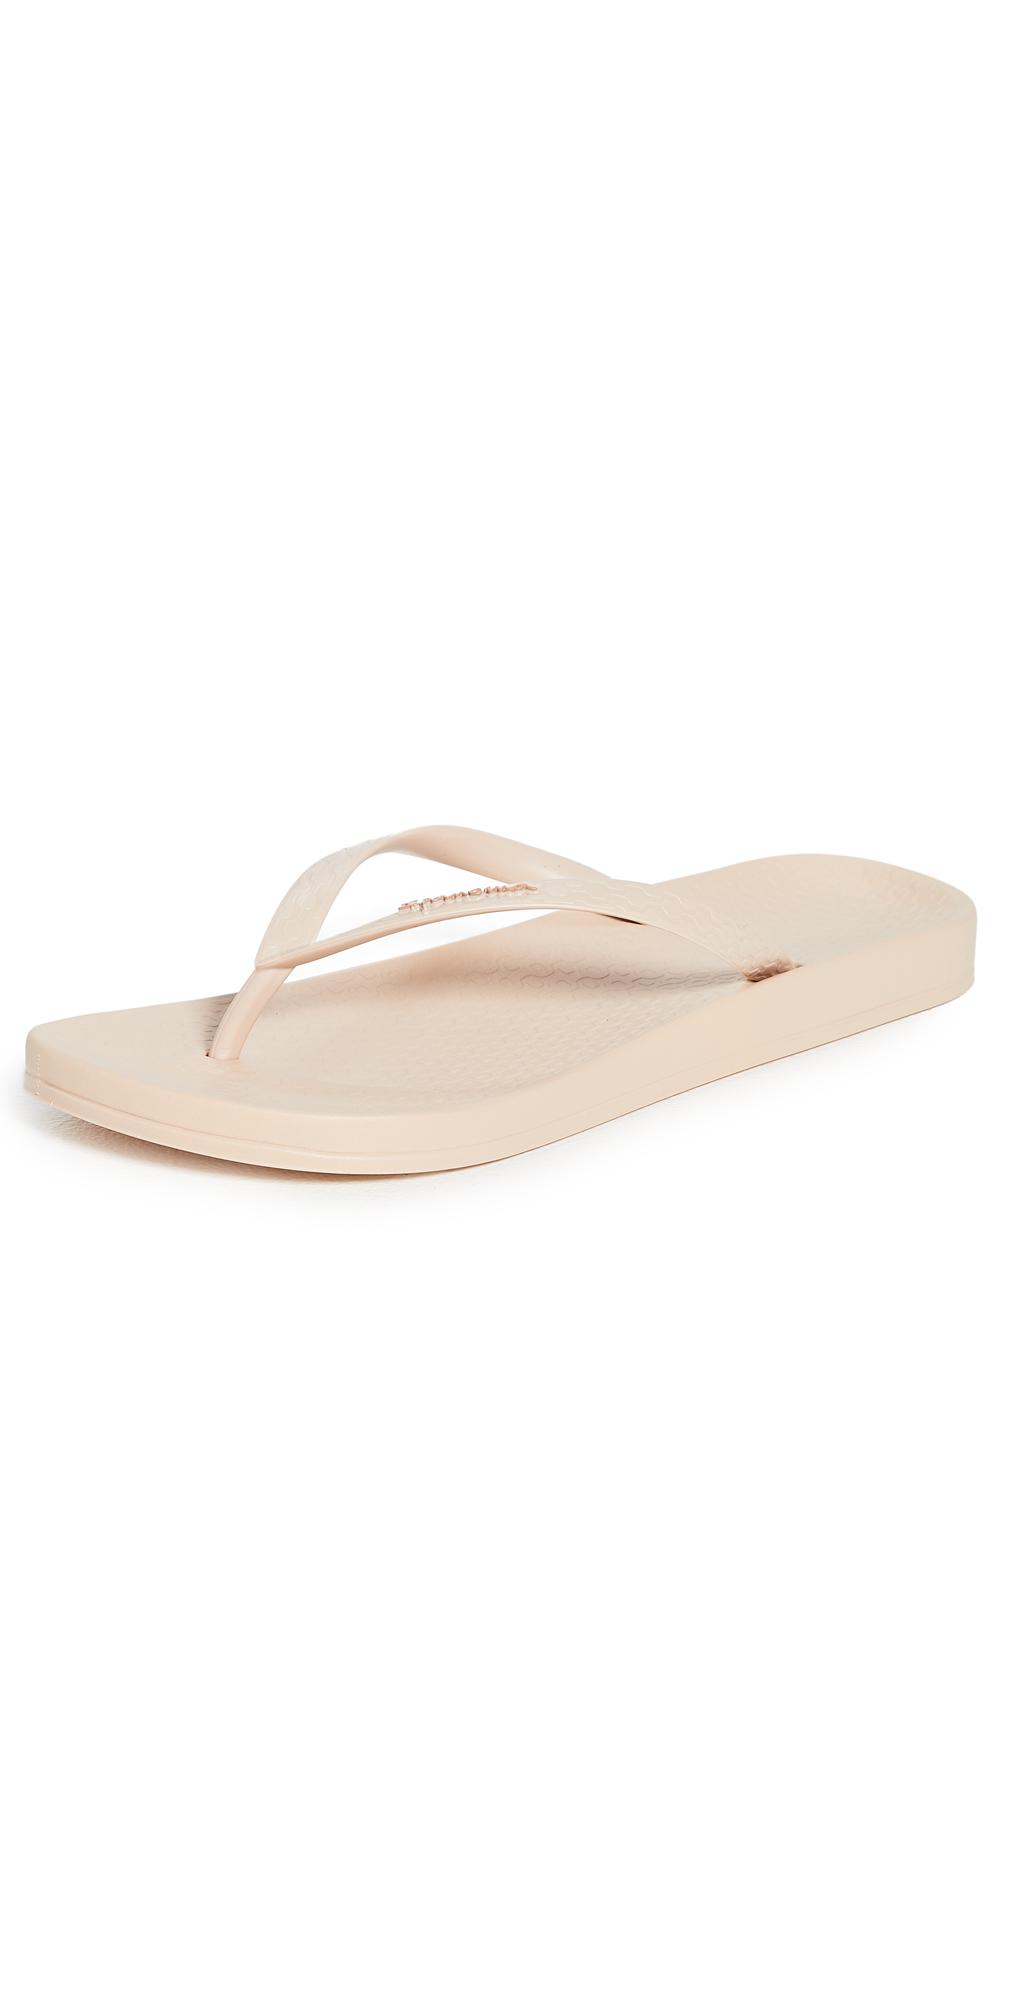 Ana Colors Flip Flops